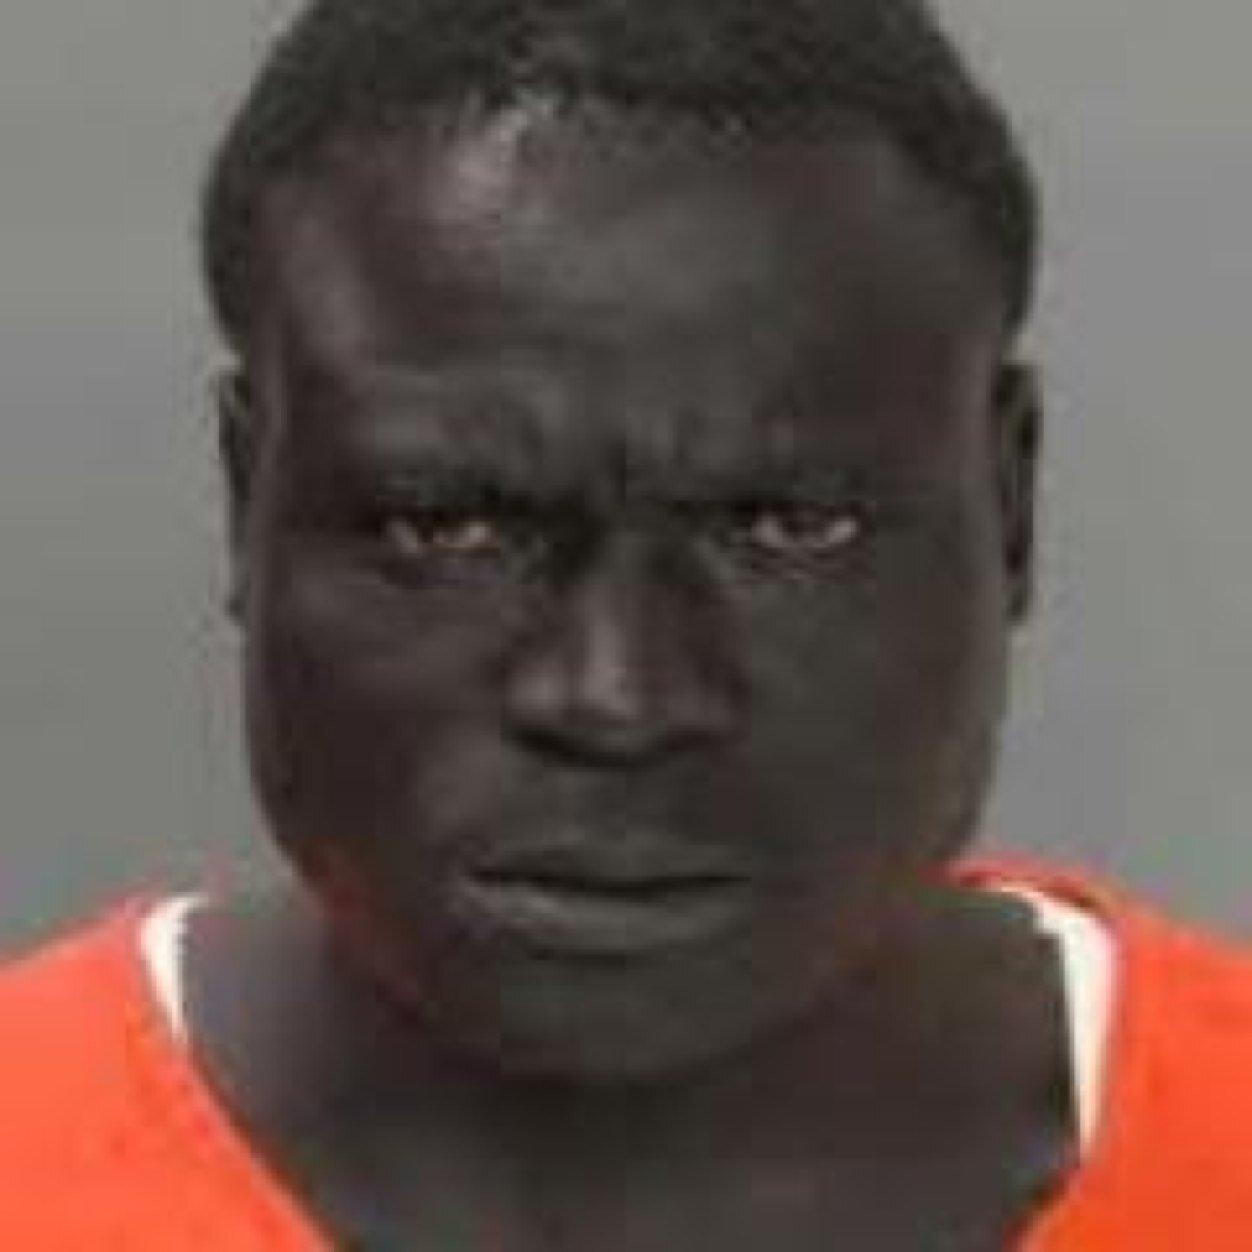 Scary Black Guy